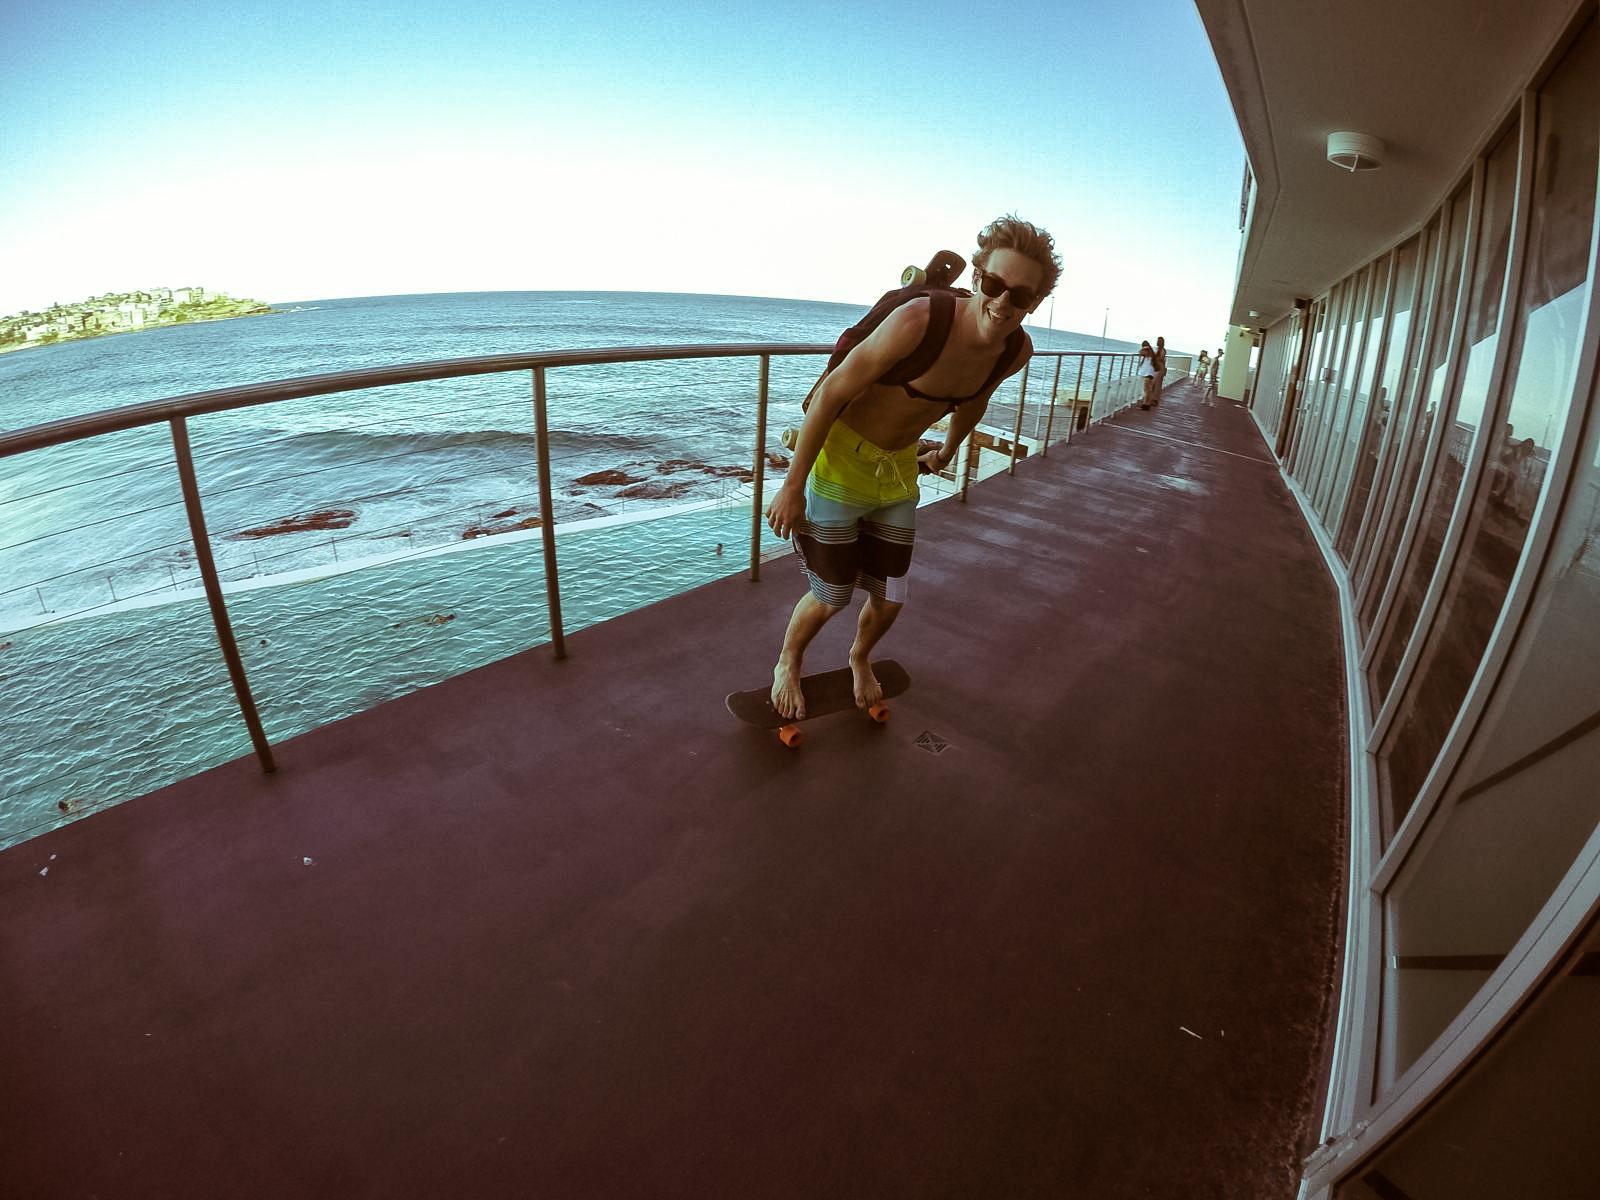 Bondie beach skate